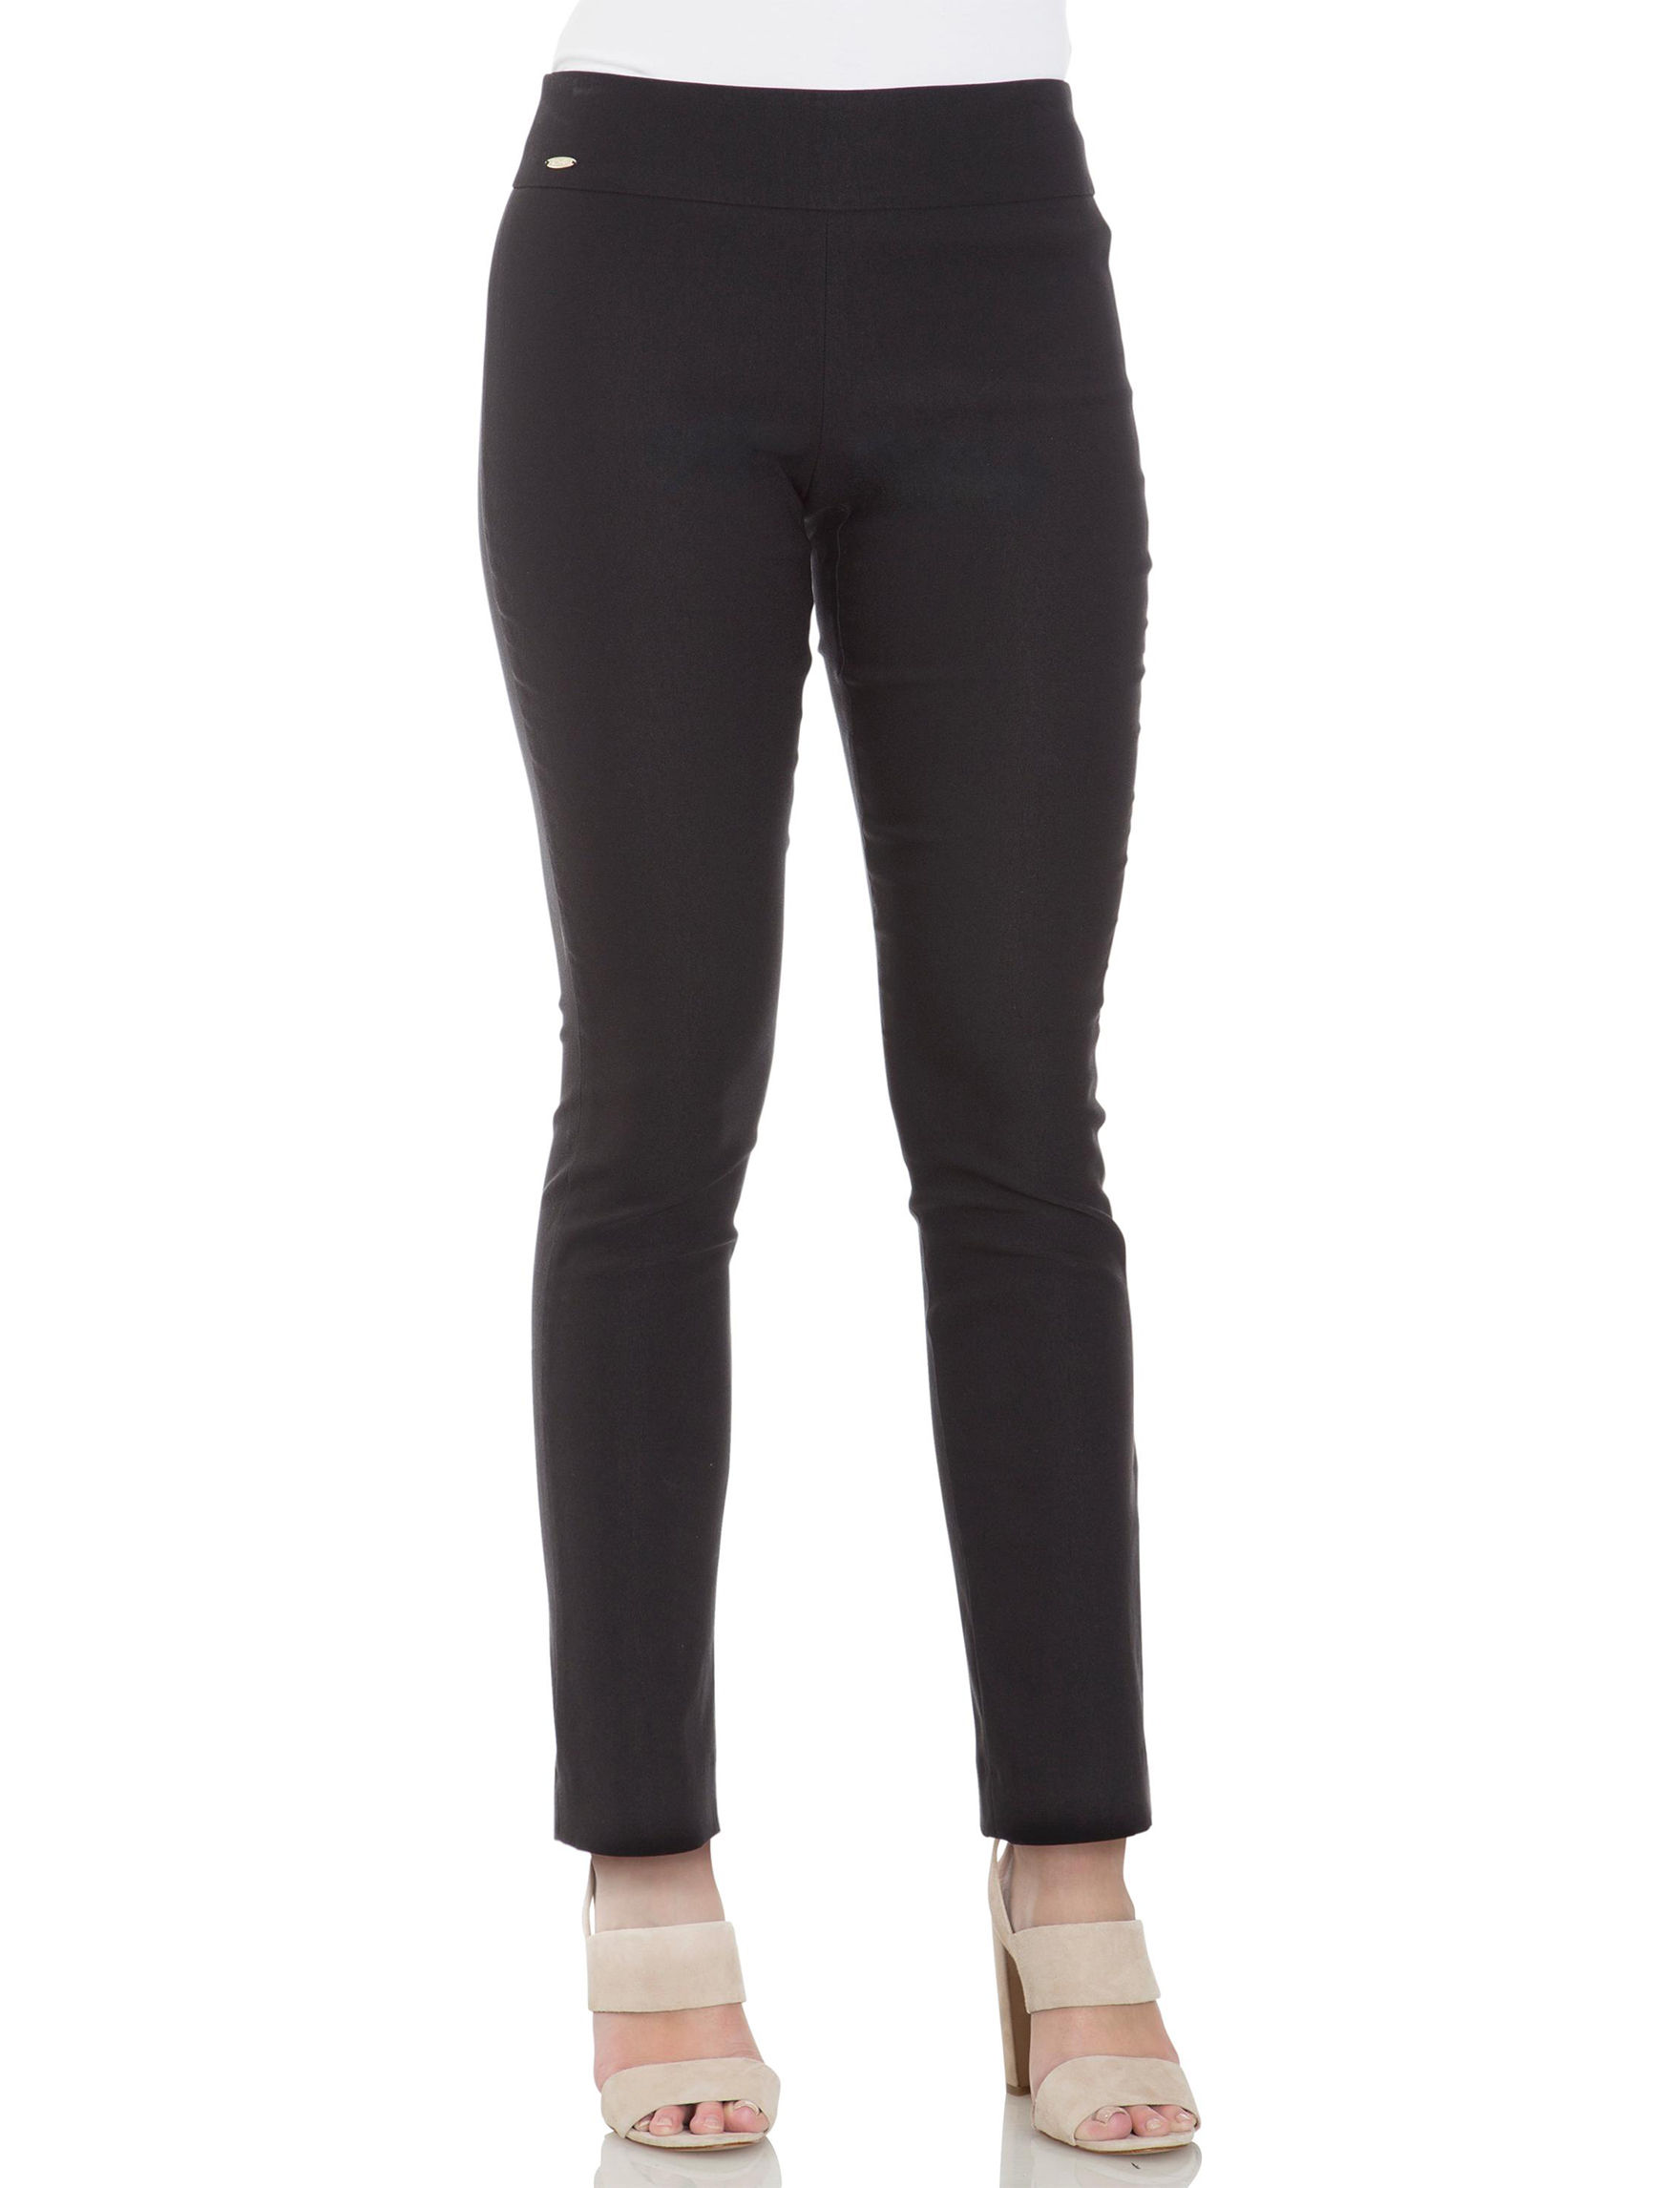 Izod Black Soft Pants